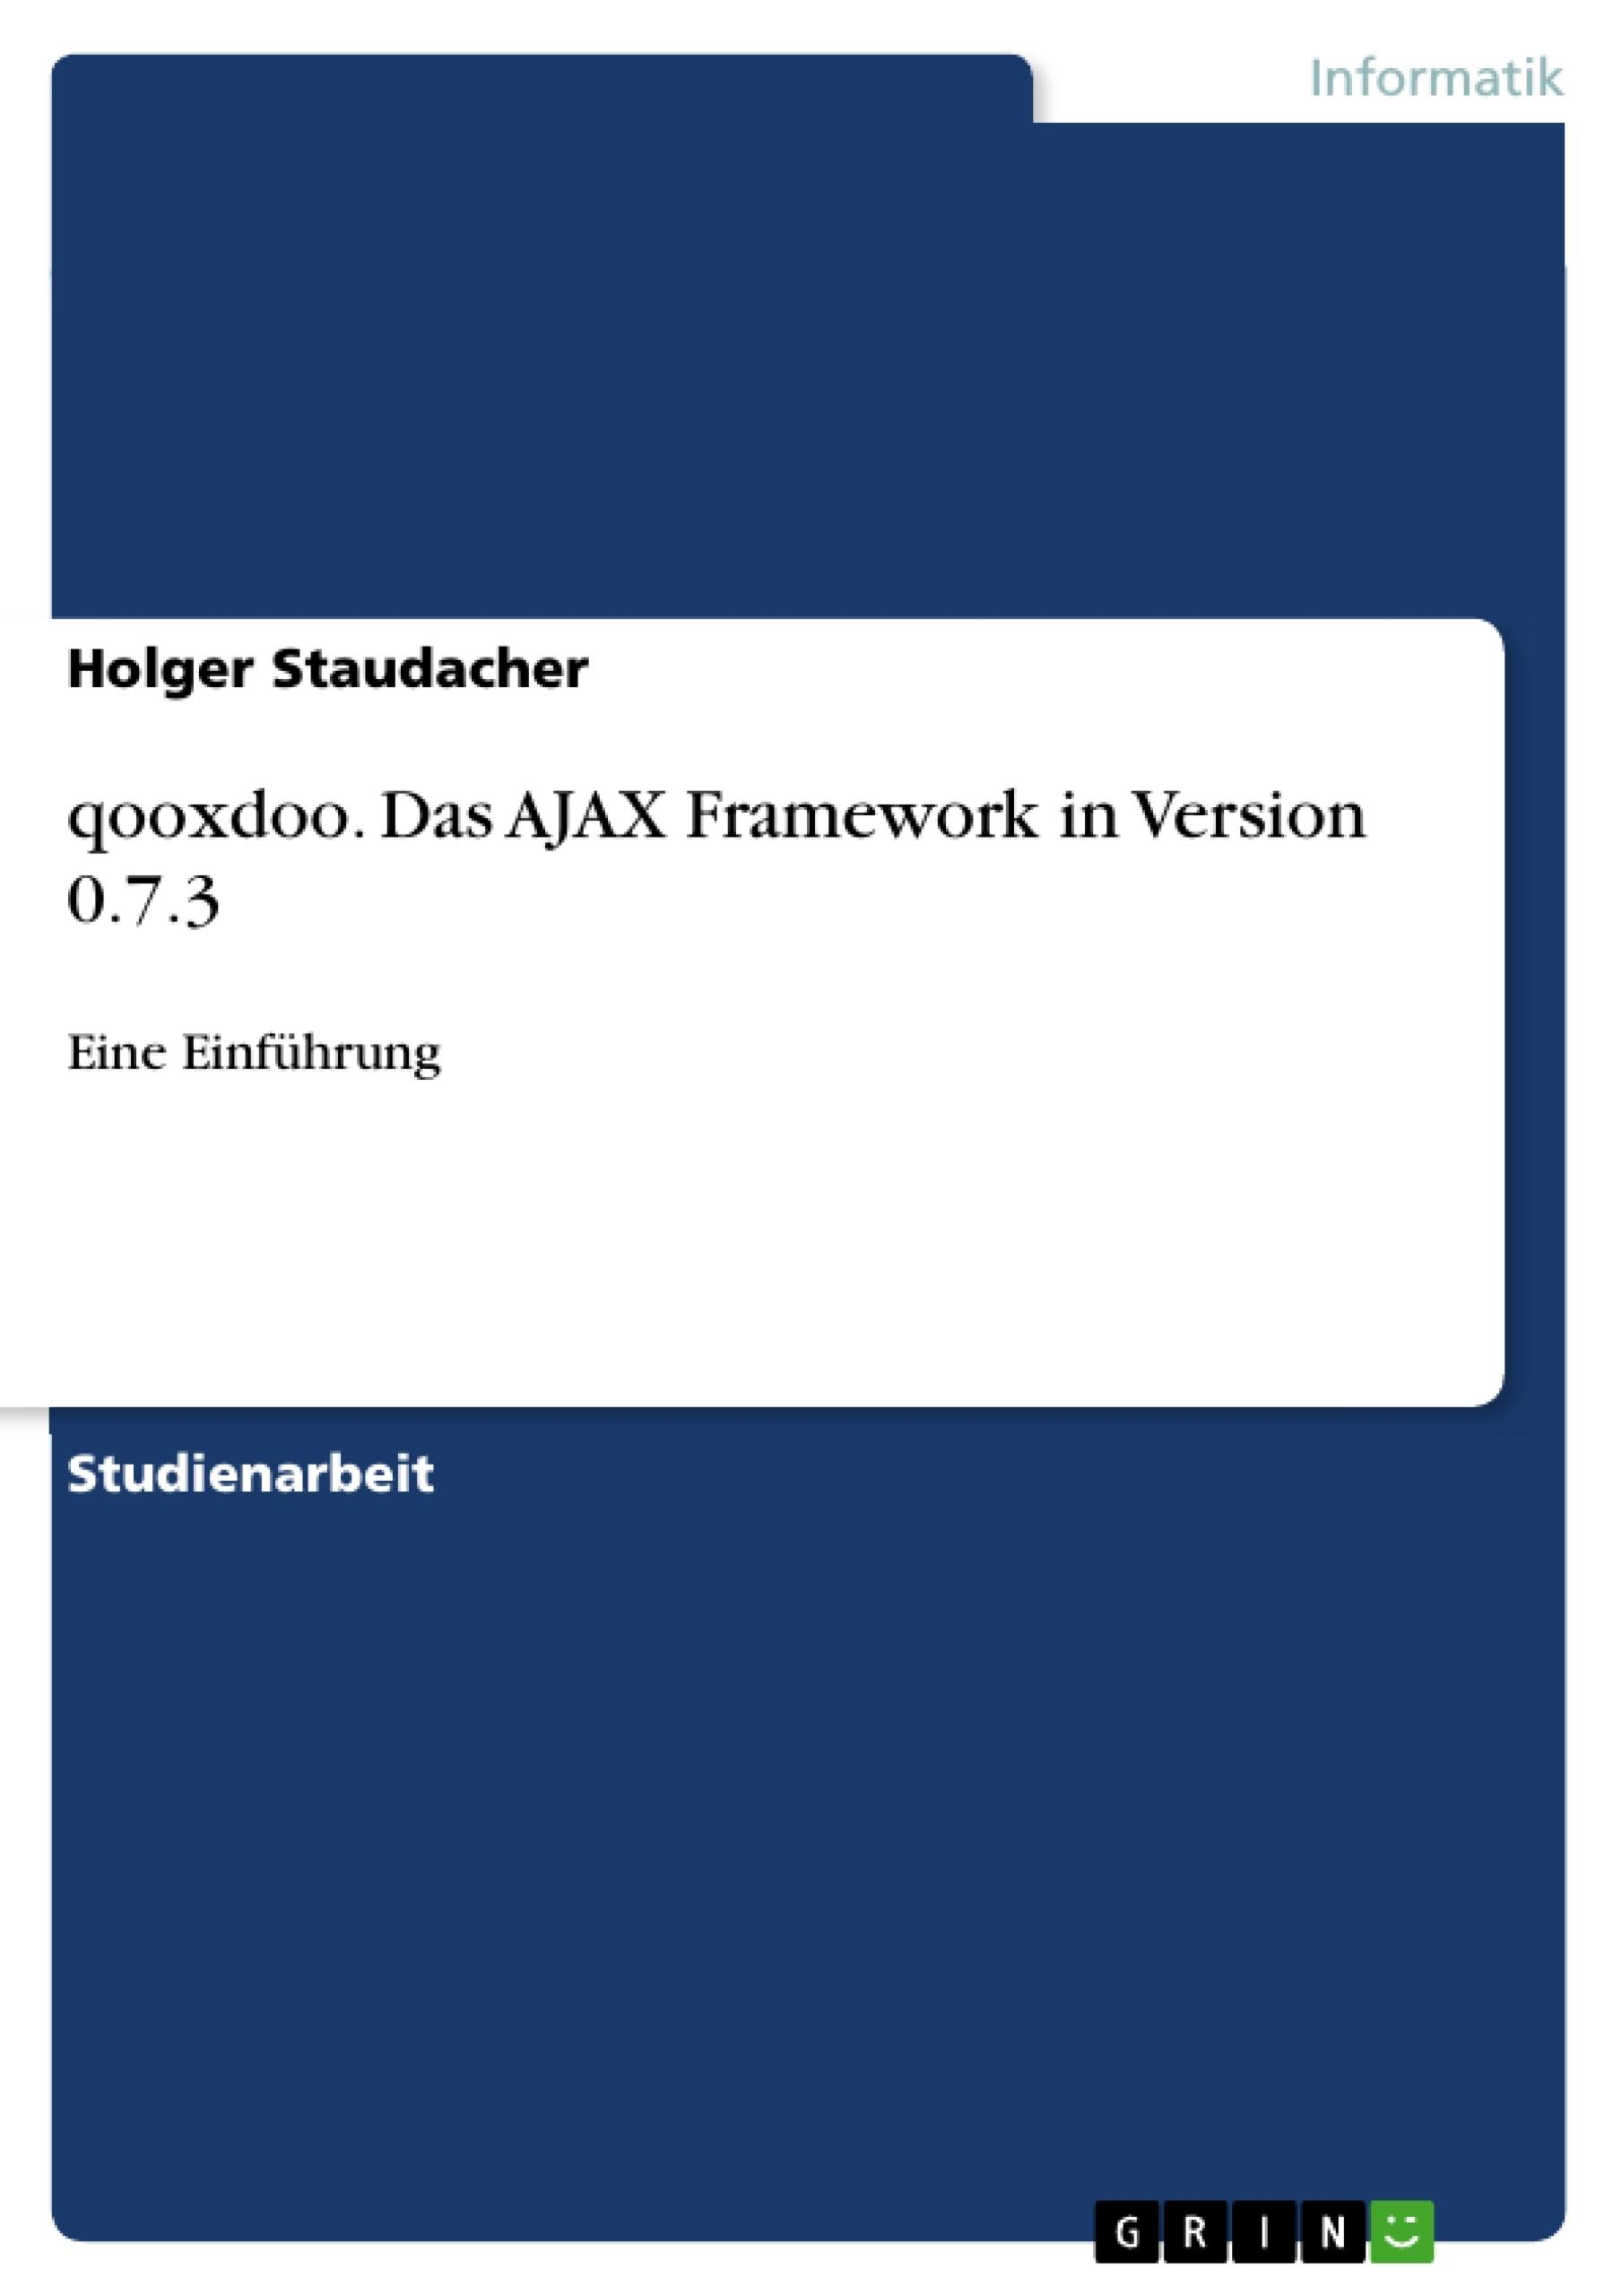 Titel: qooxdoo. Das AJAX Framework in Version 0.7.3